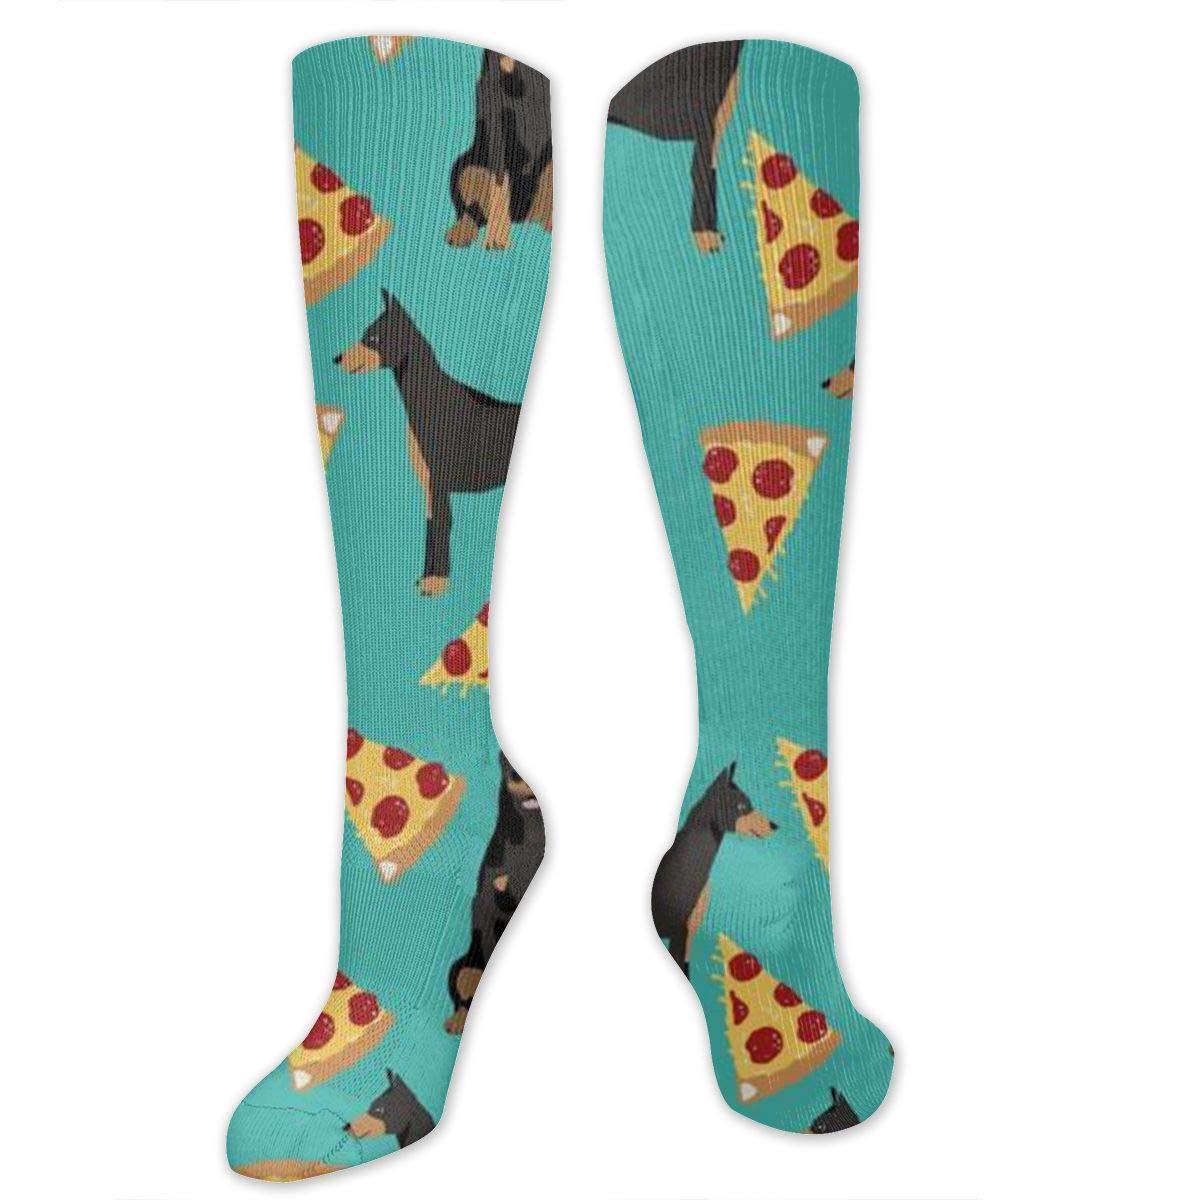 Chanwazibibiliu Doberman Pinscher Turquoise Pizza Mens Colorful Dress Socks Funky Men Multicolored Pattern Fashionable Fun Crew Cotton Socks